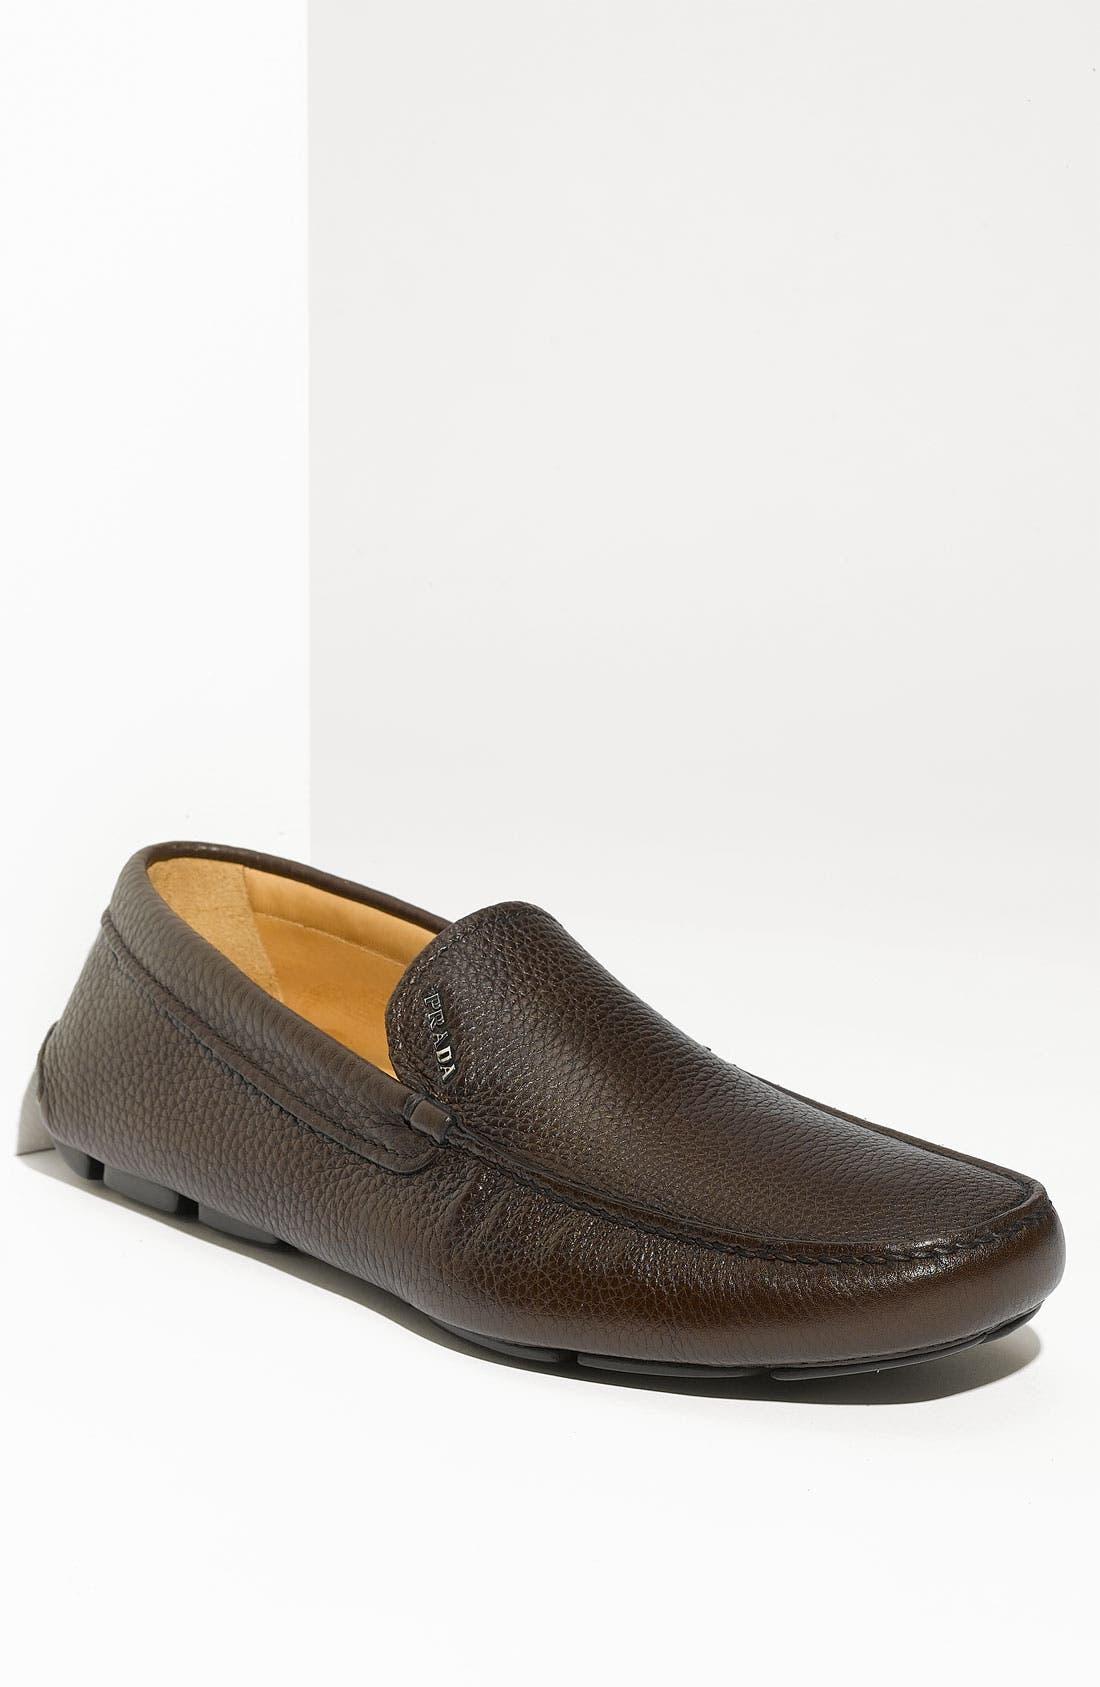 Alternate Image 1 Selected - Prada Pebbled Leather Driving Shoe (Men)